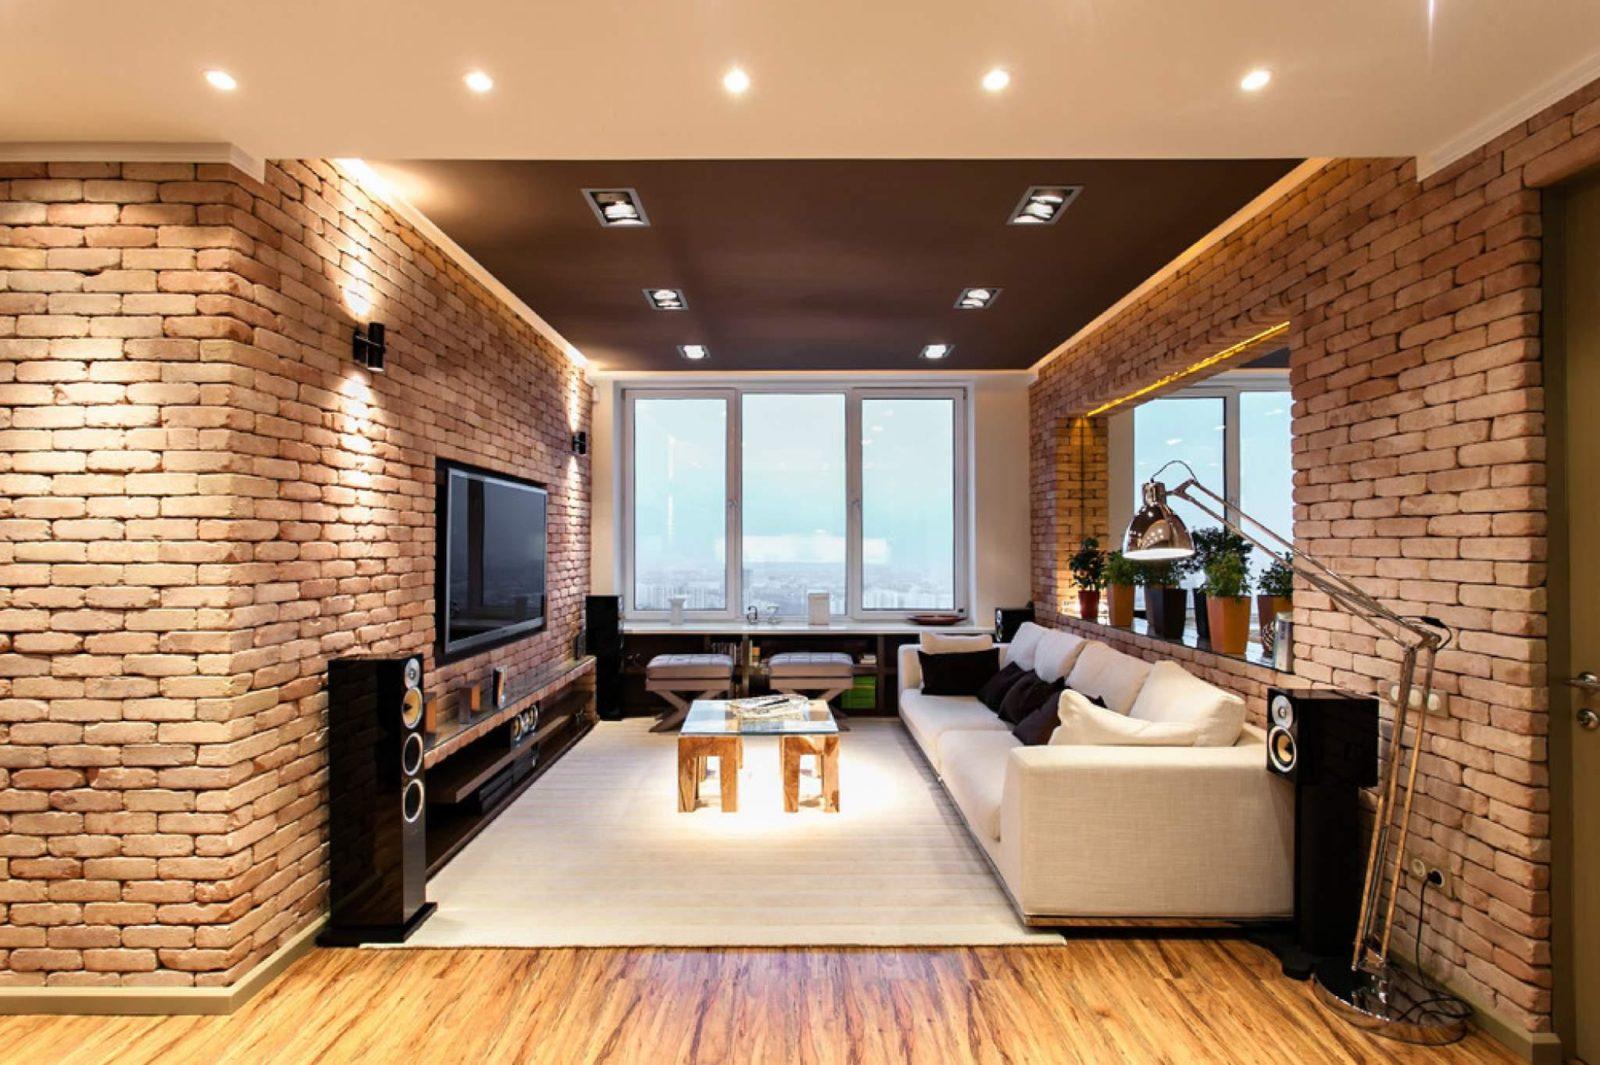 О ремонте квартир и домов